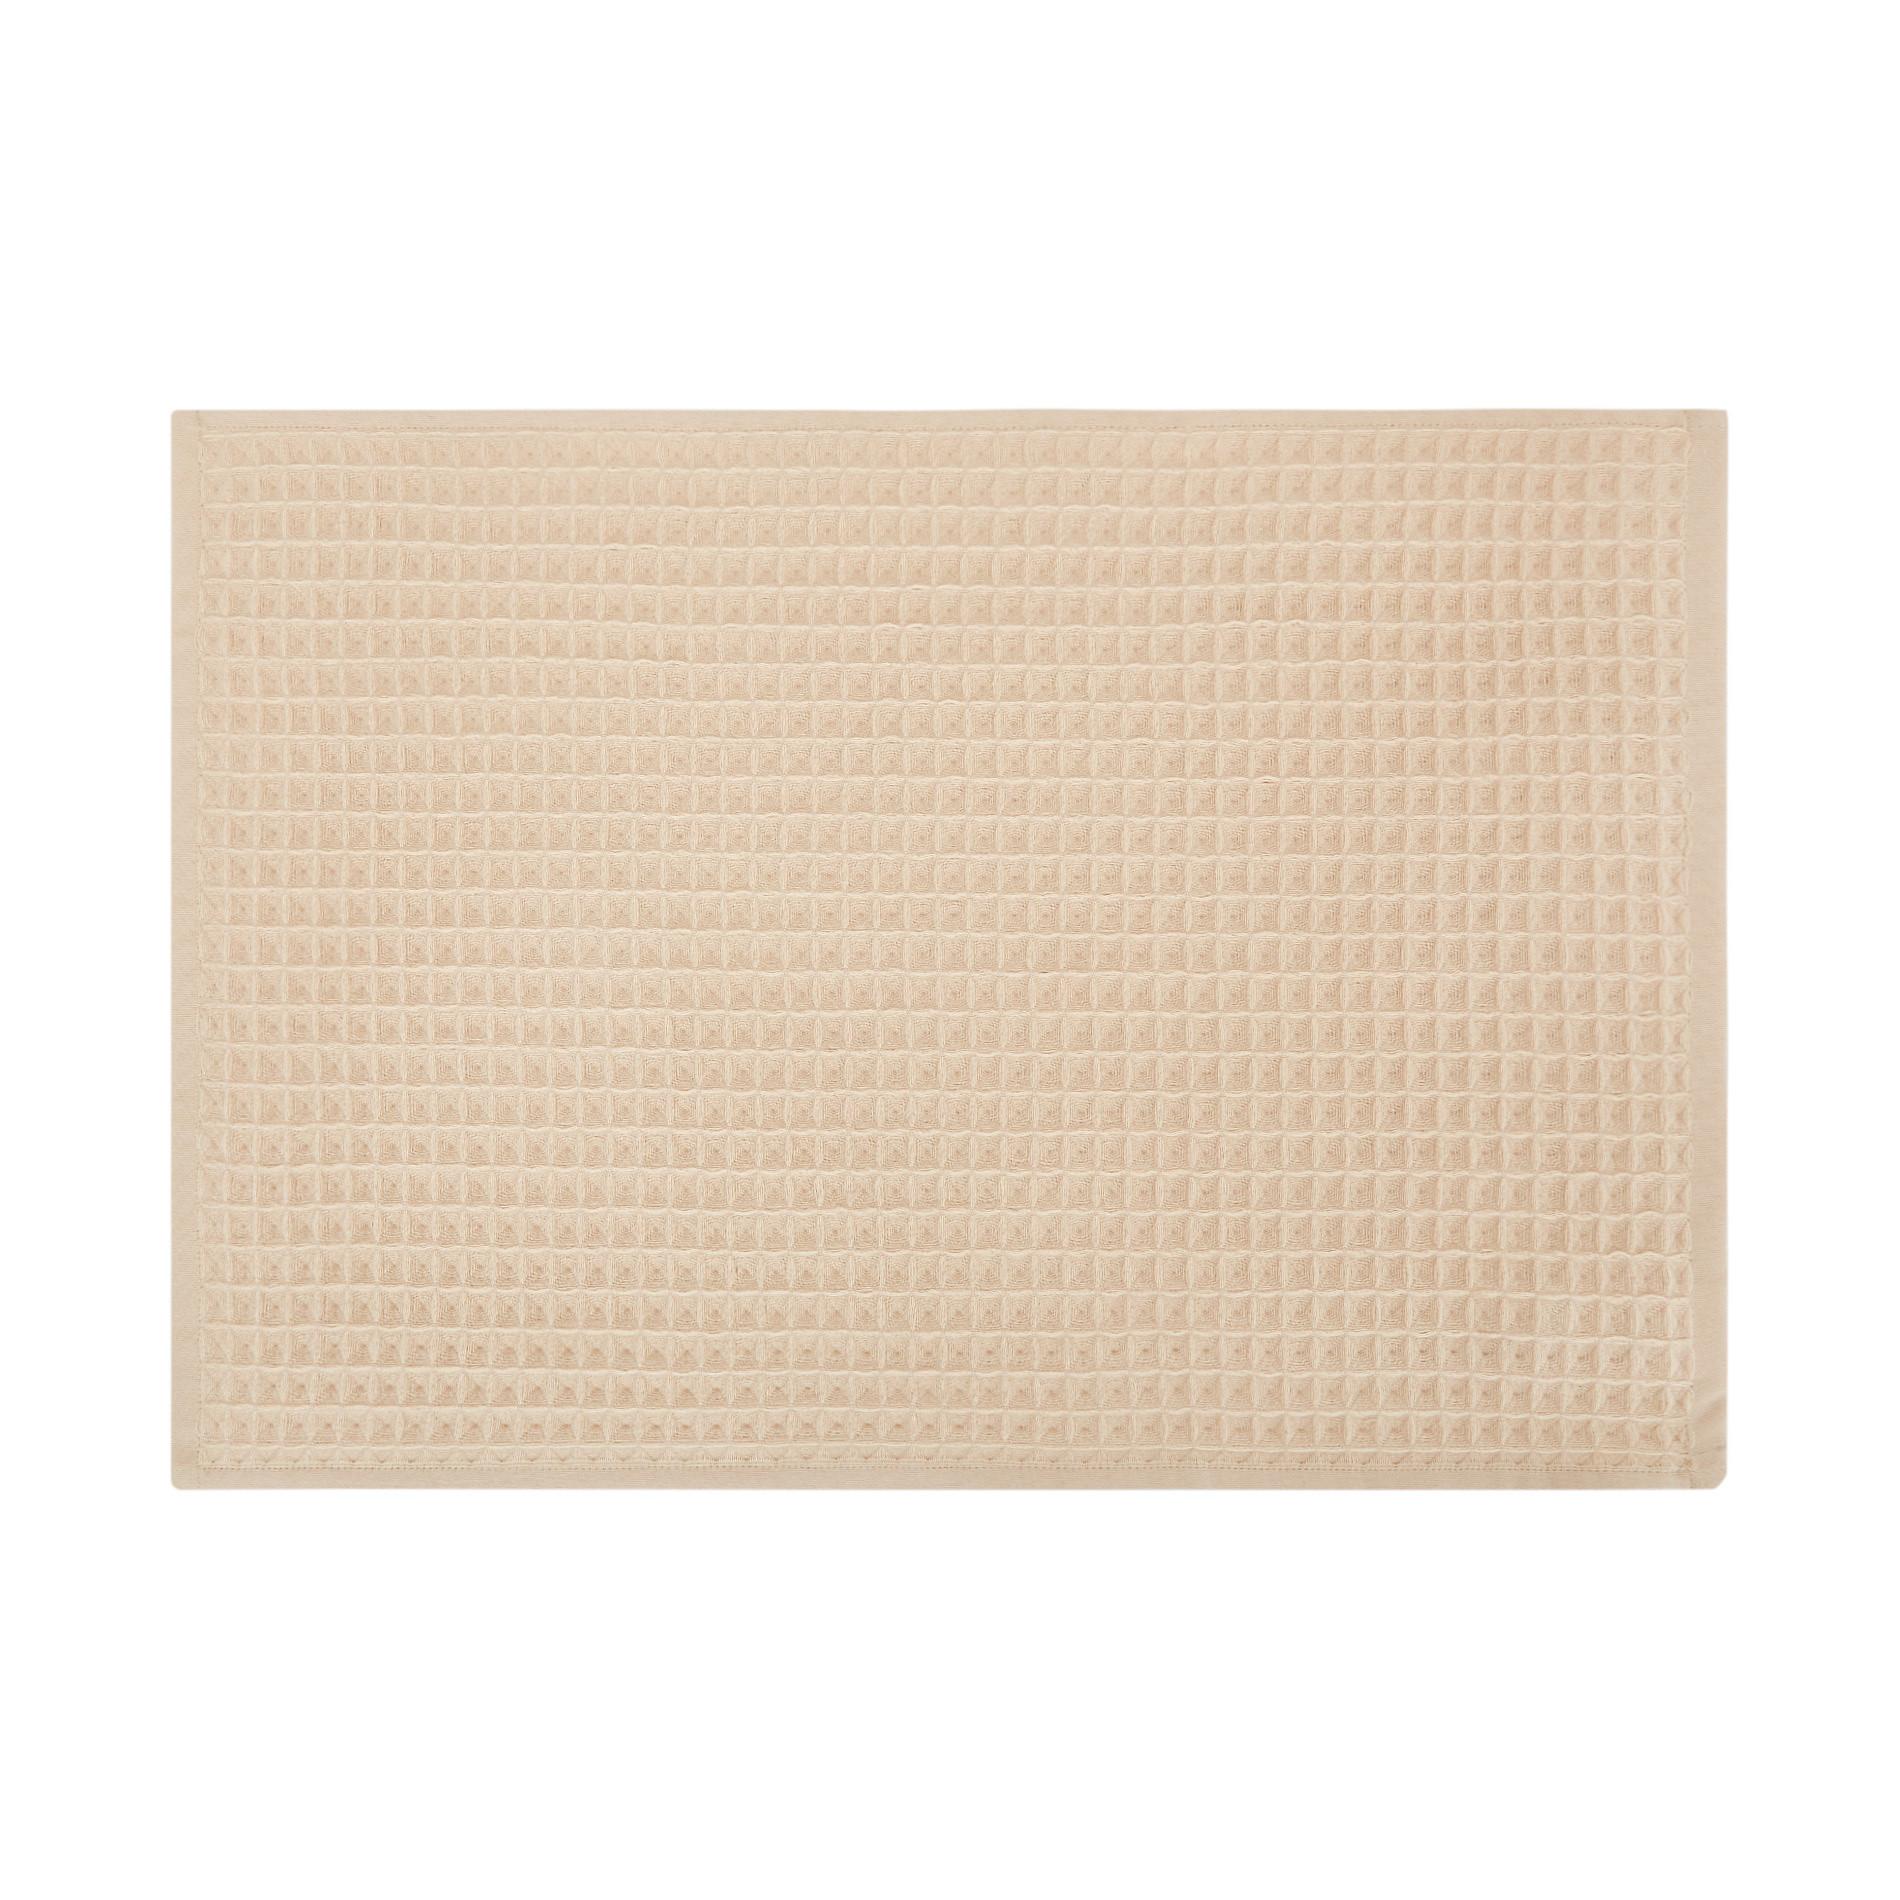 Set 2 asciugamani puro cotone nido d'ape tinta unita, Beige, large image number 1